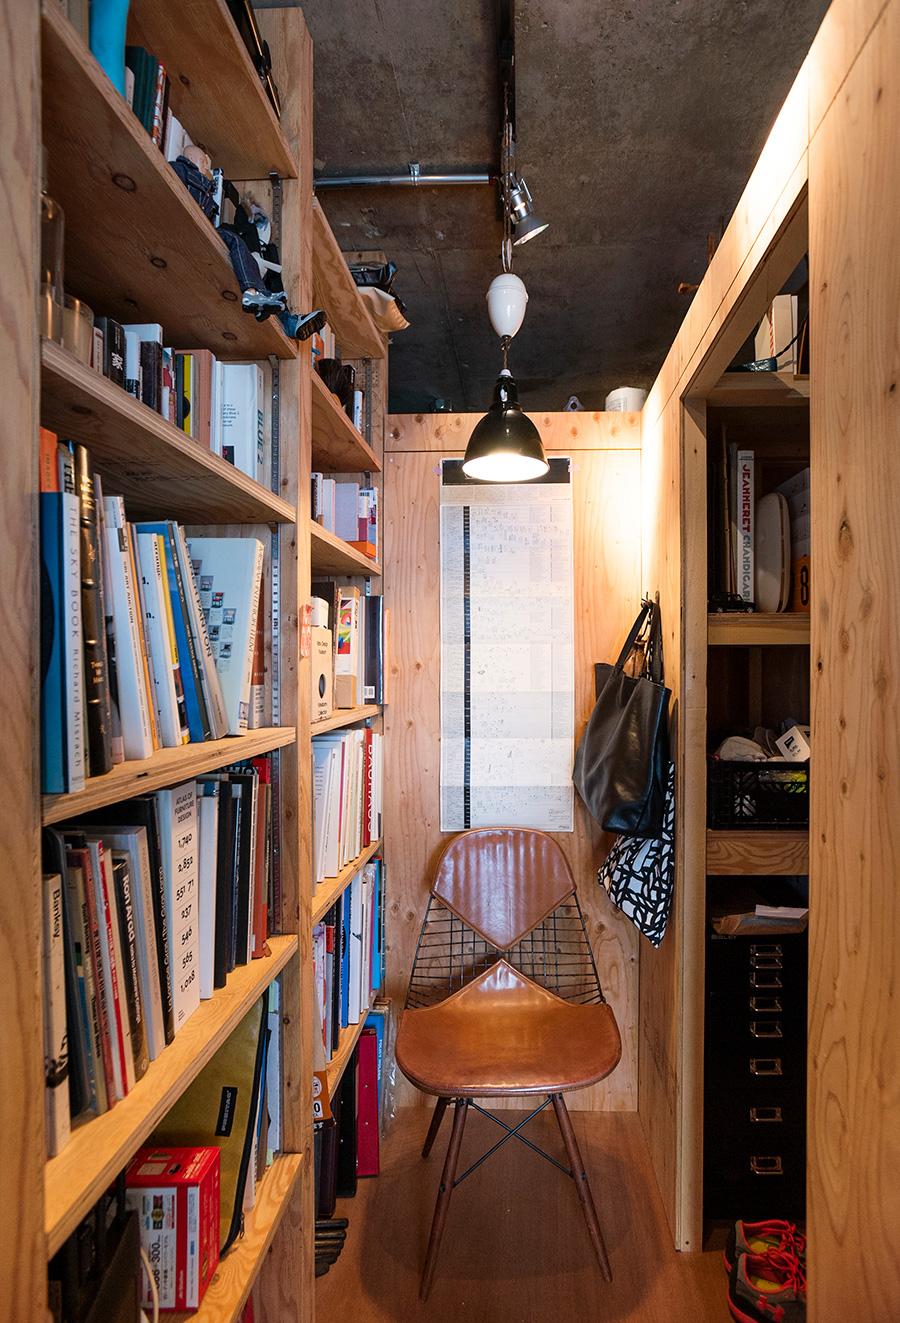 1950'sのイームズ PKWは、木の脚で回転するところがレア。突き当たりの壁はDIYで作成したもの。左手に本棚、右手が収納。